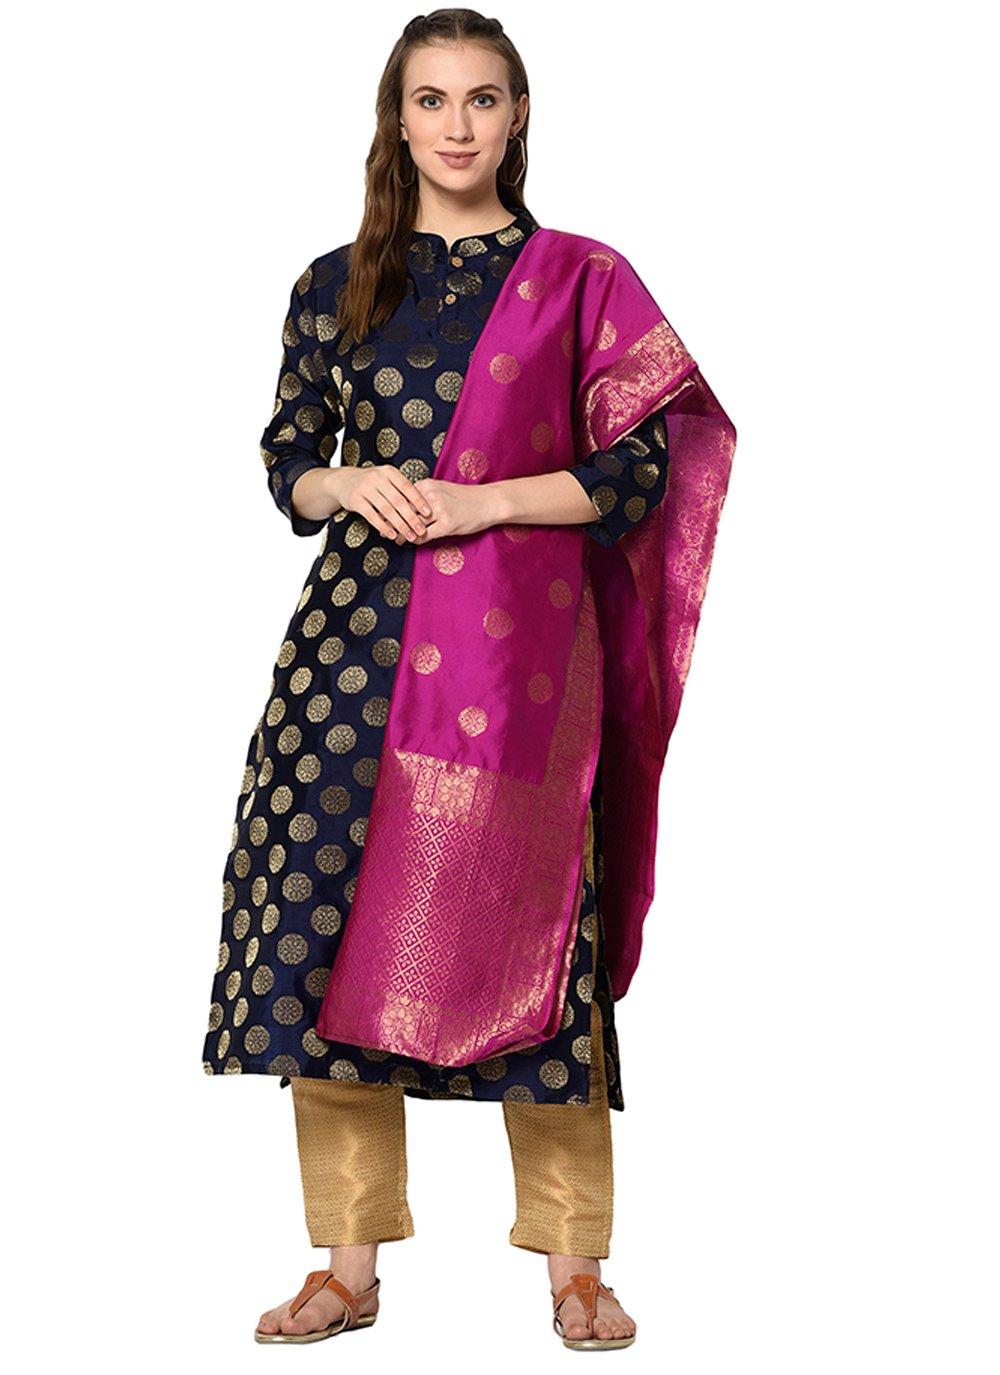 Designer Salwar Kameez Abstract Print Cotton in Navy Blue